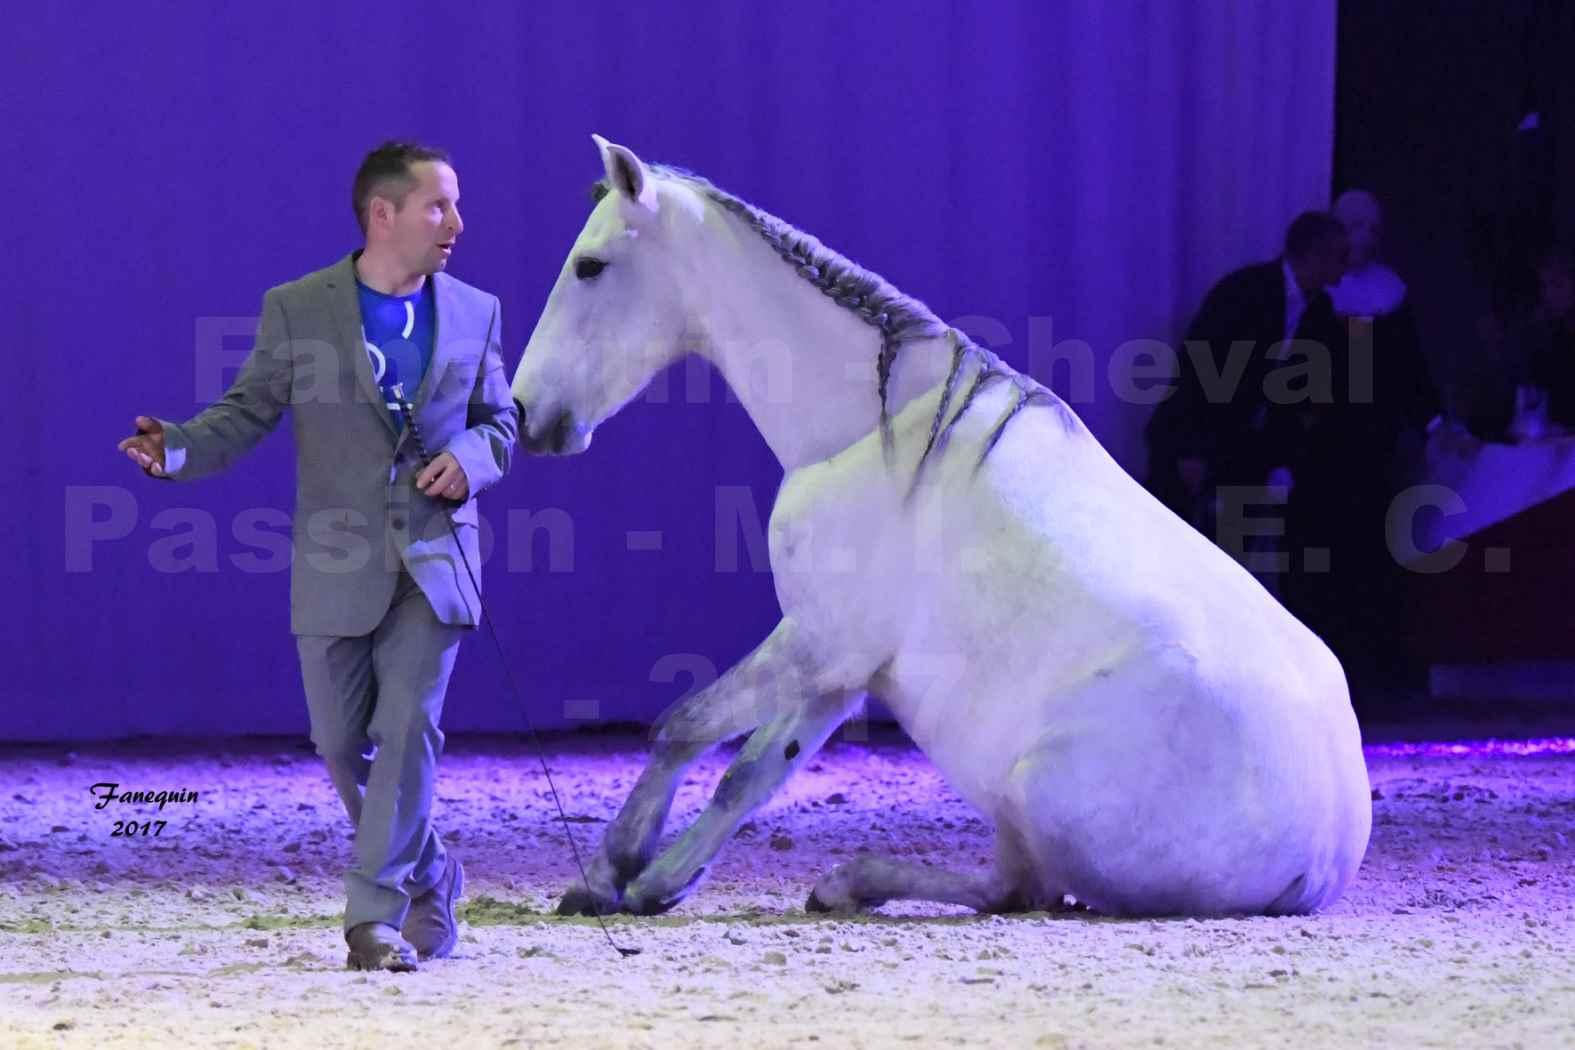 Cheval Passion 2017 - M. I. S. E. C. - Ludovic LONGO & 1 cheval en liberté - 15